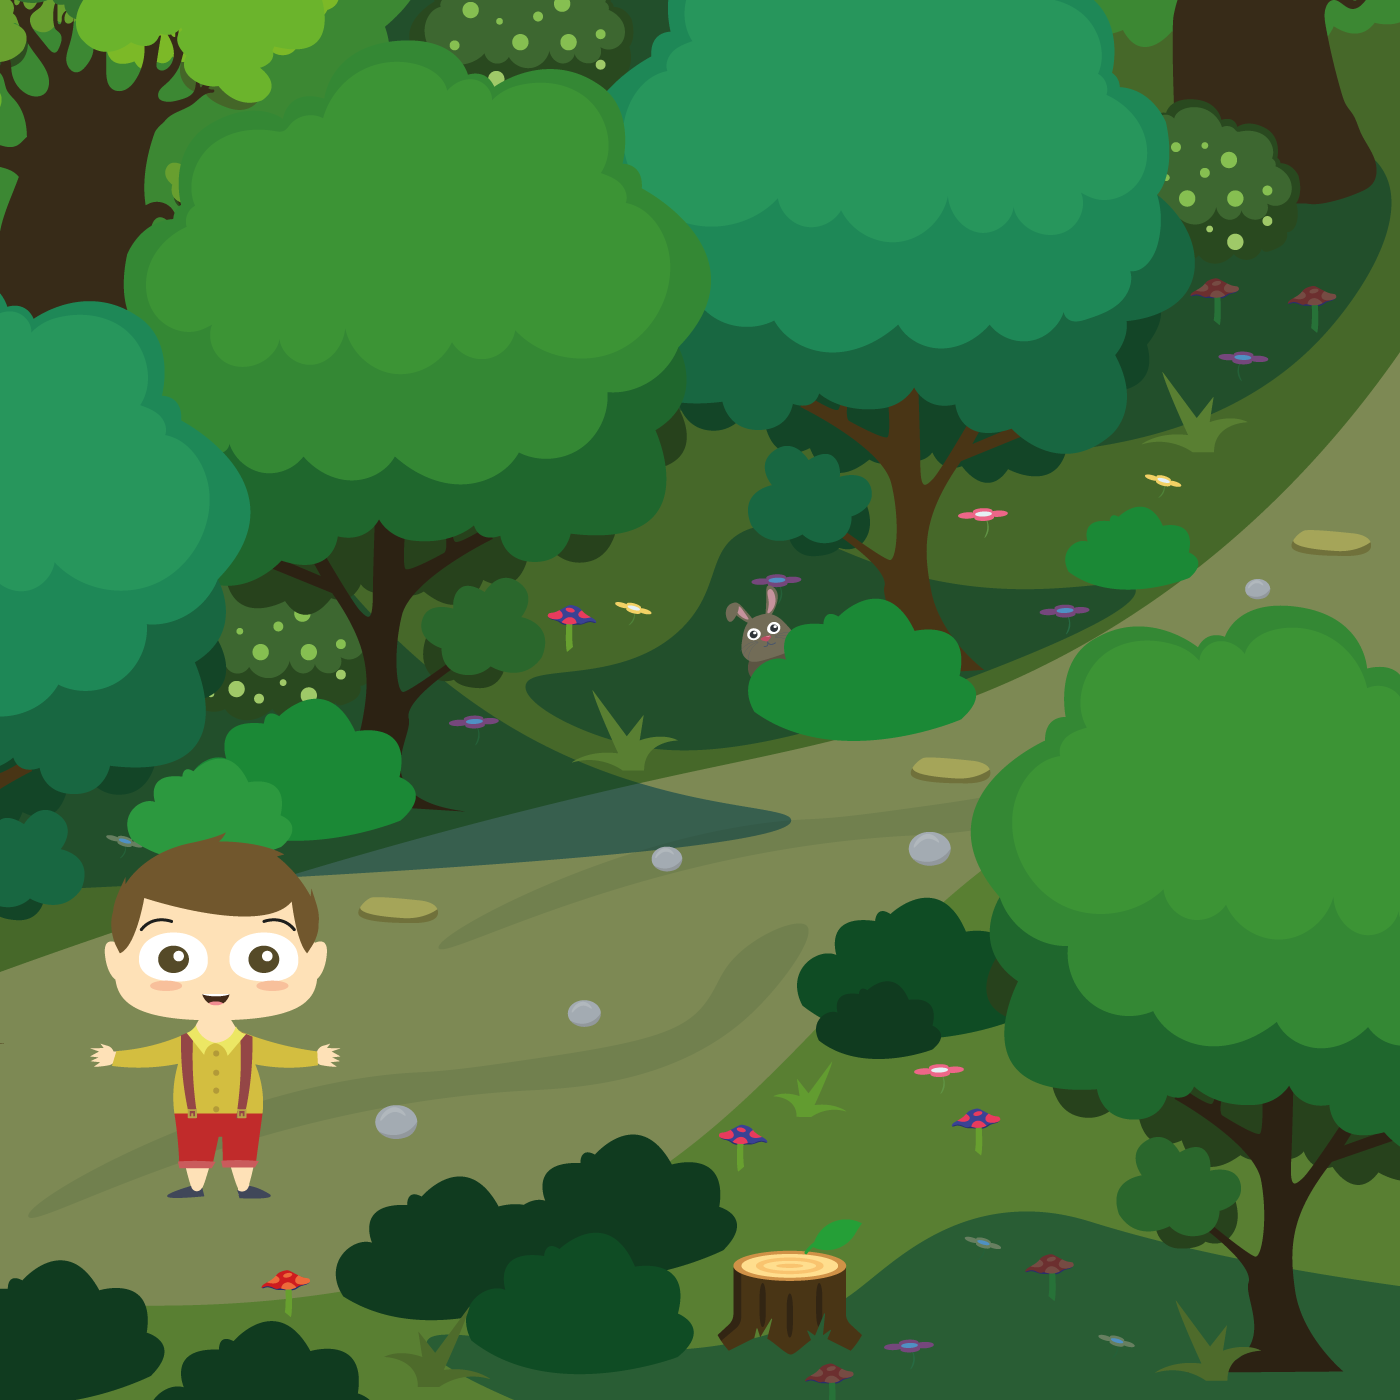 Little Tom Thumb 👦 - PART 1